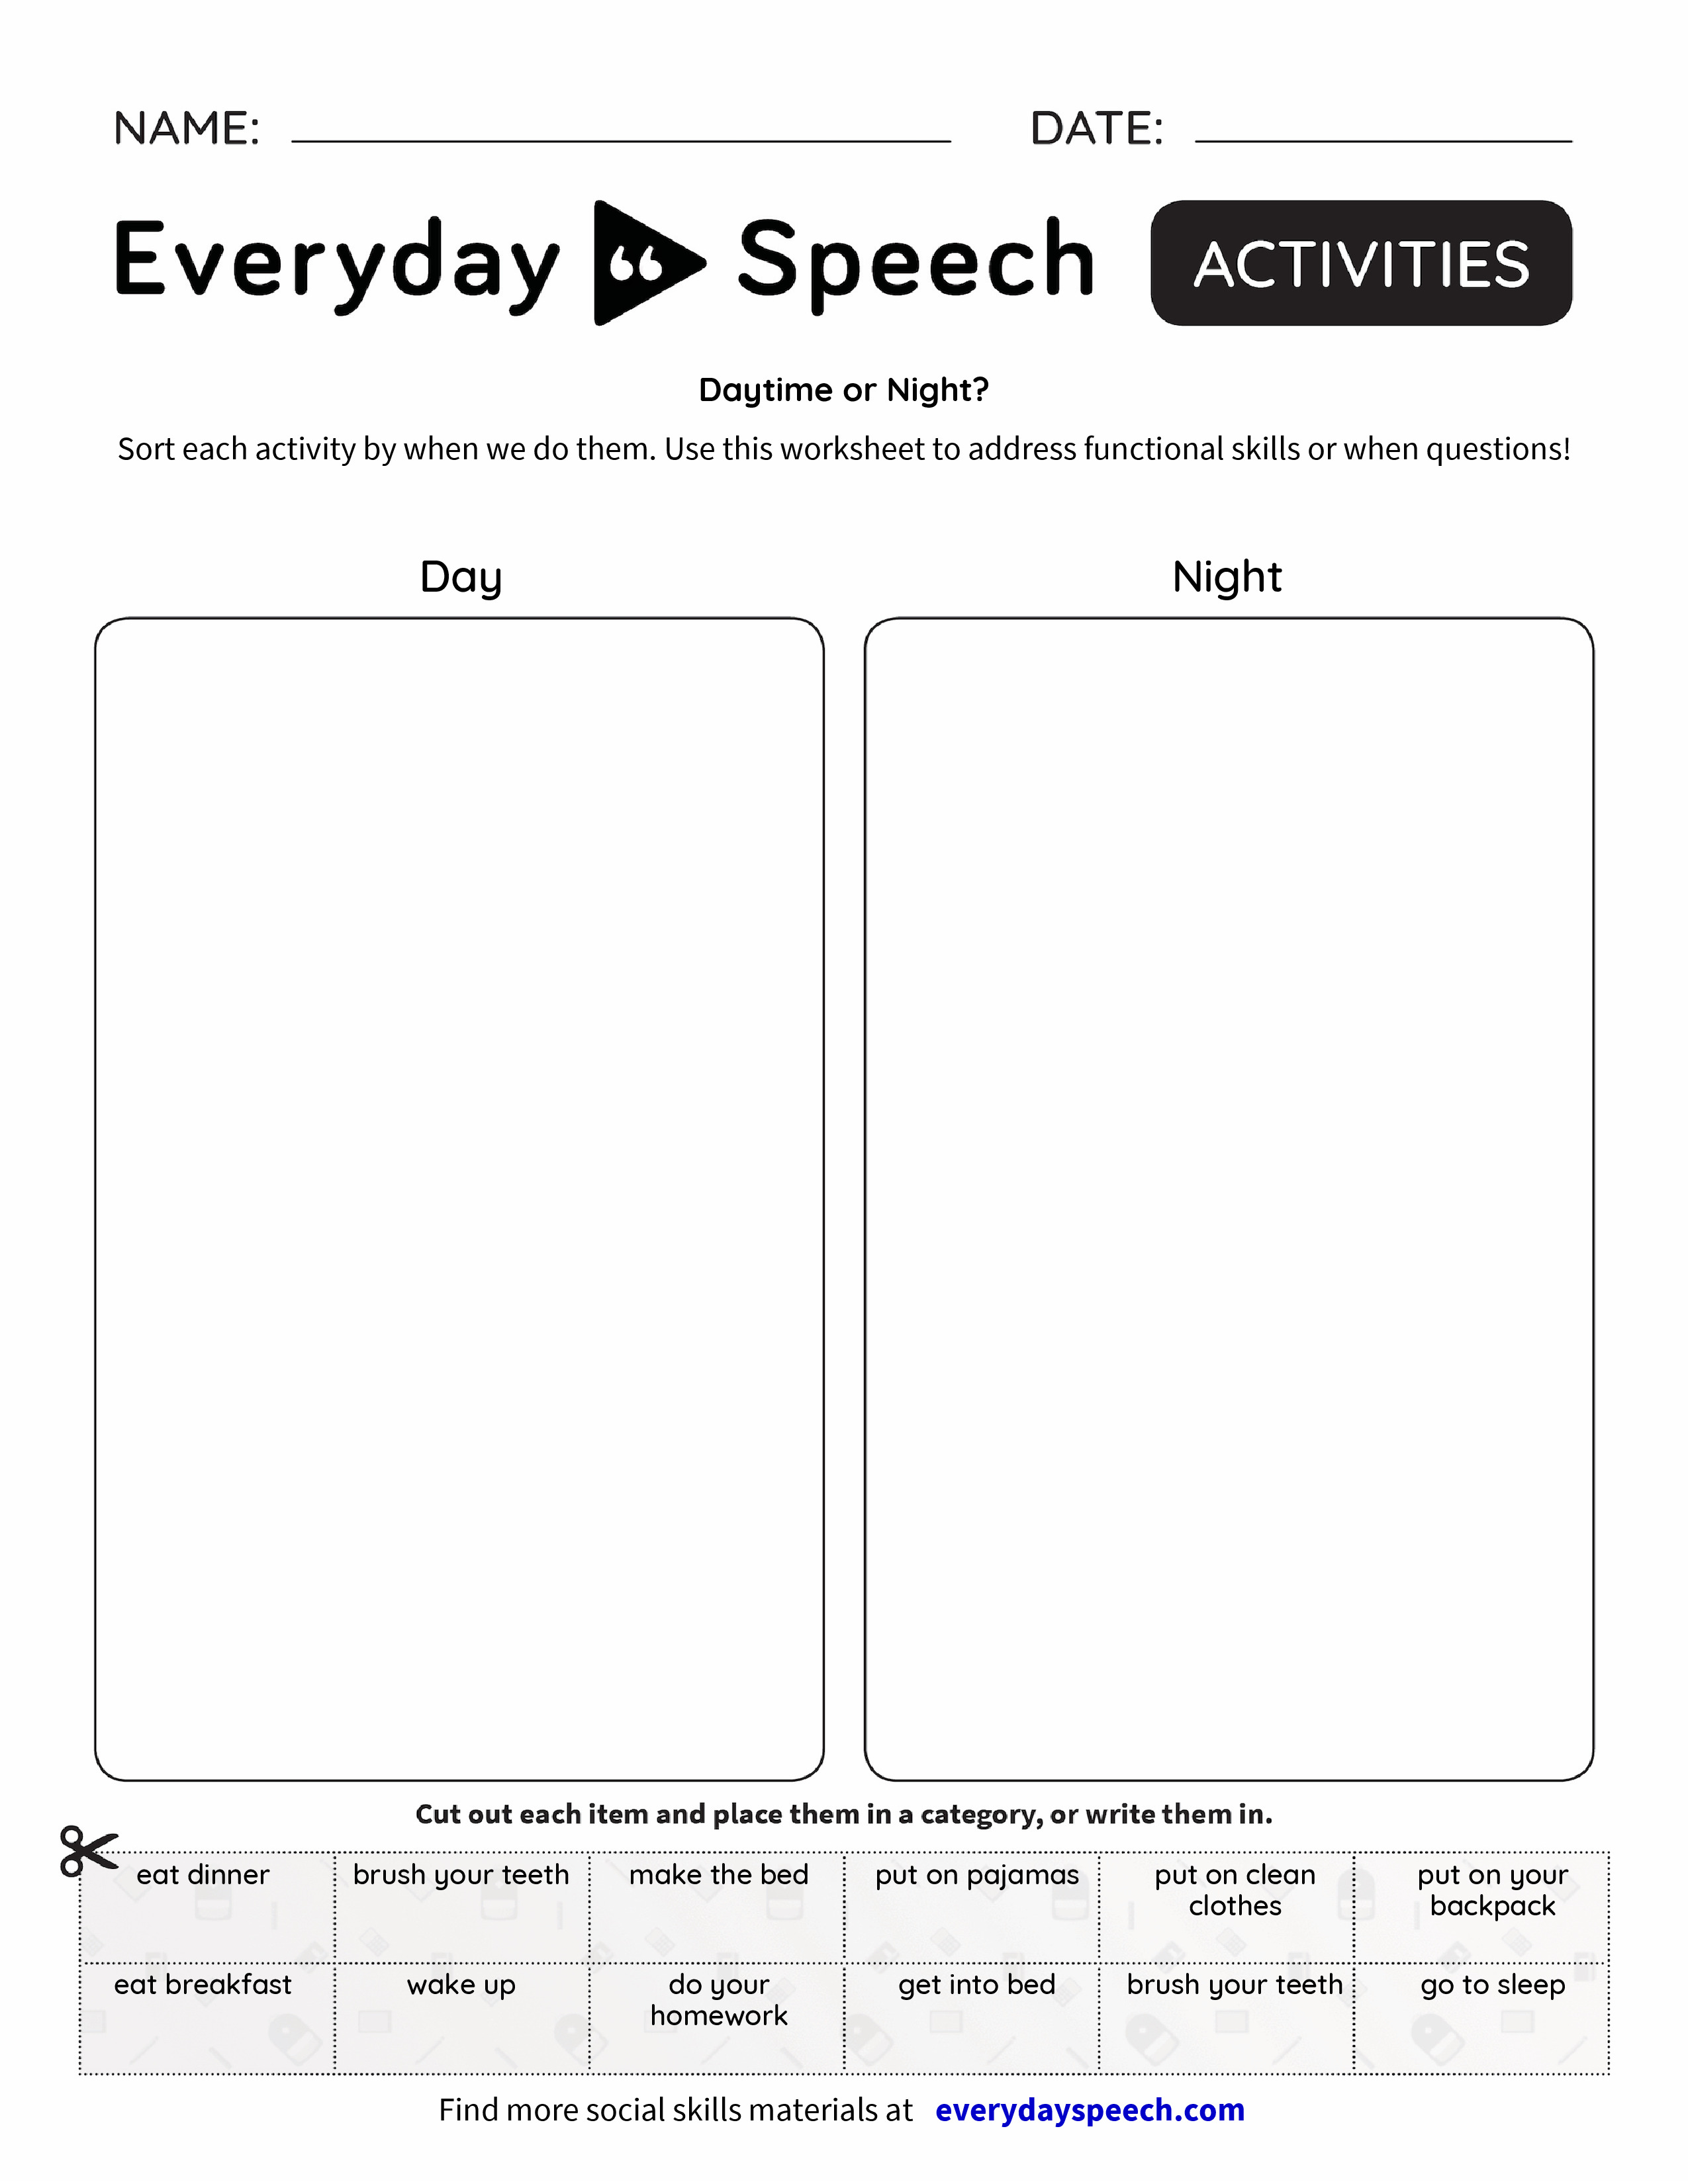 D Ytime Night Everyd Y Speech Everyd Y Speech